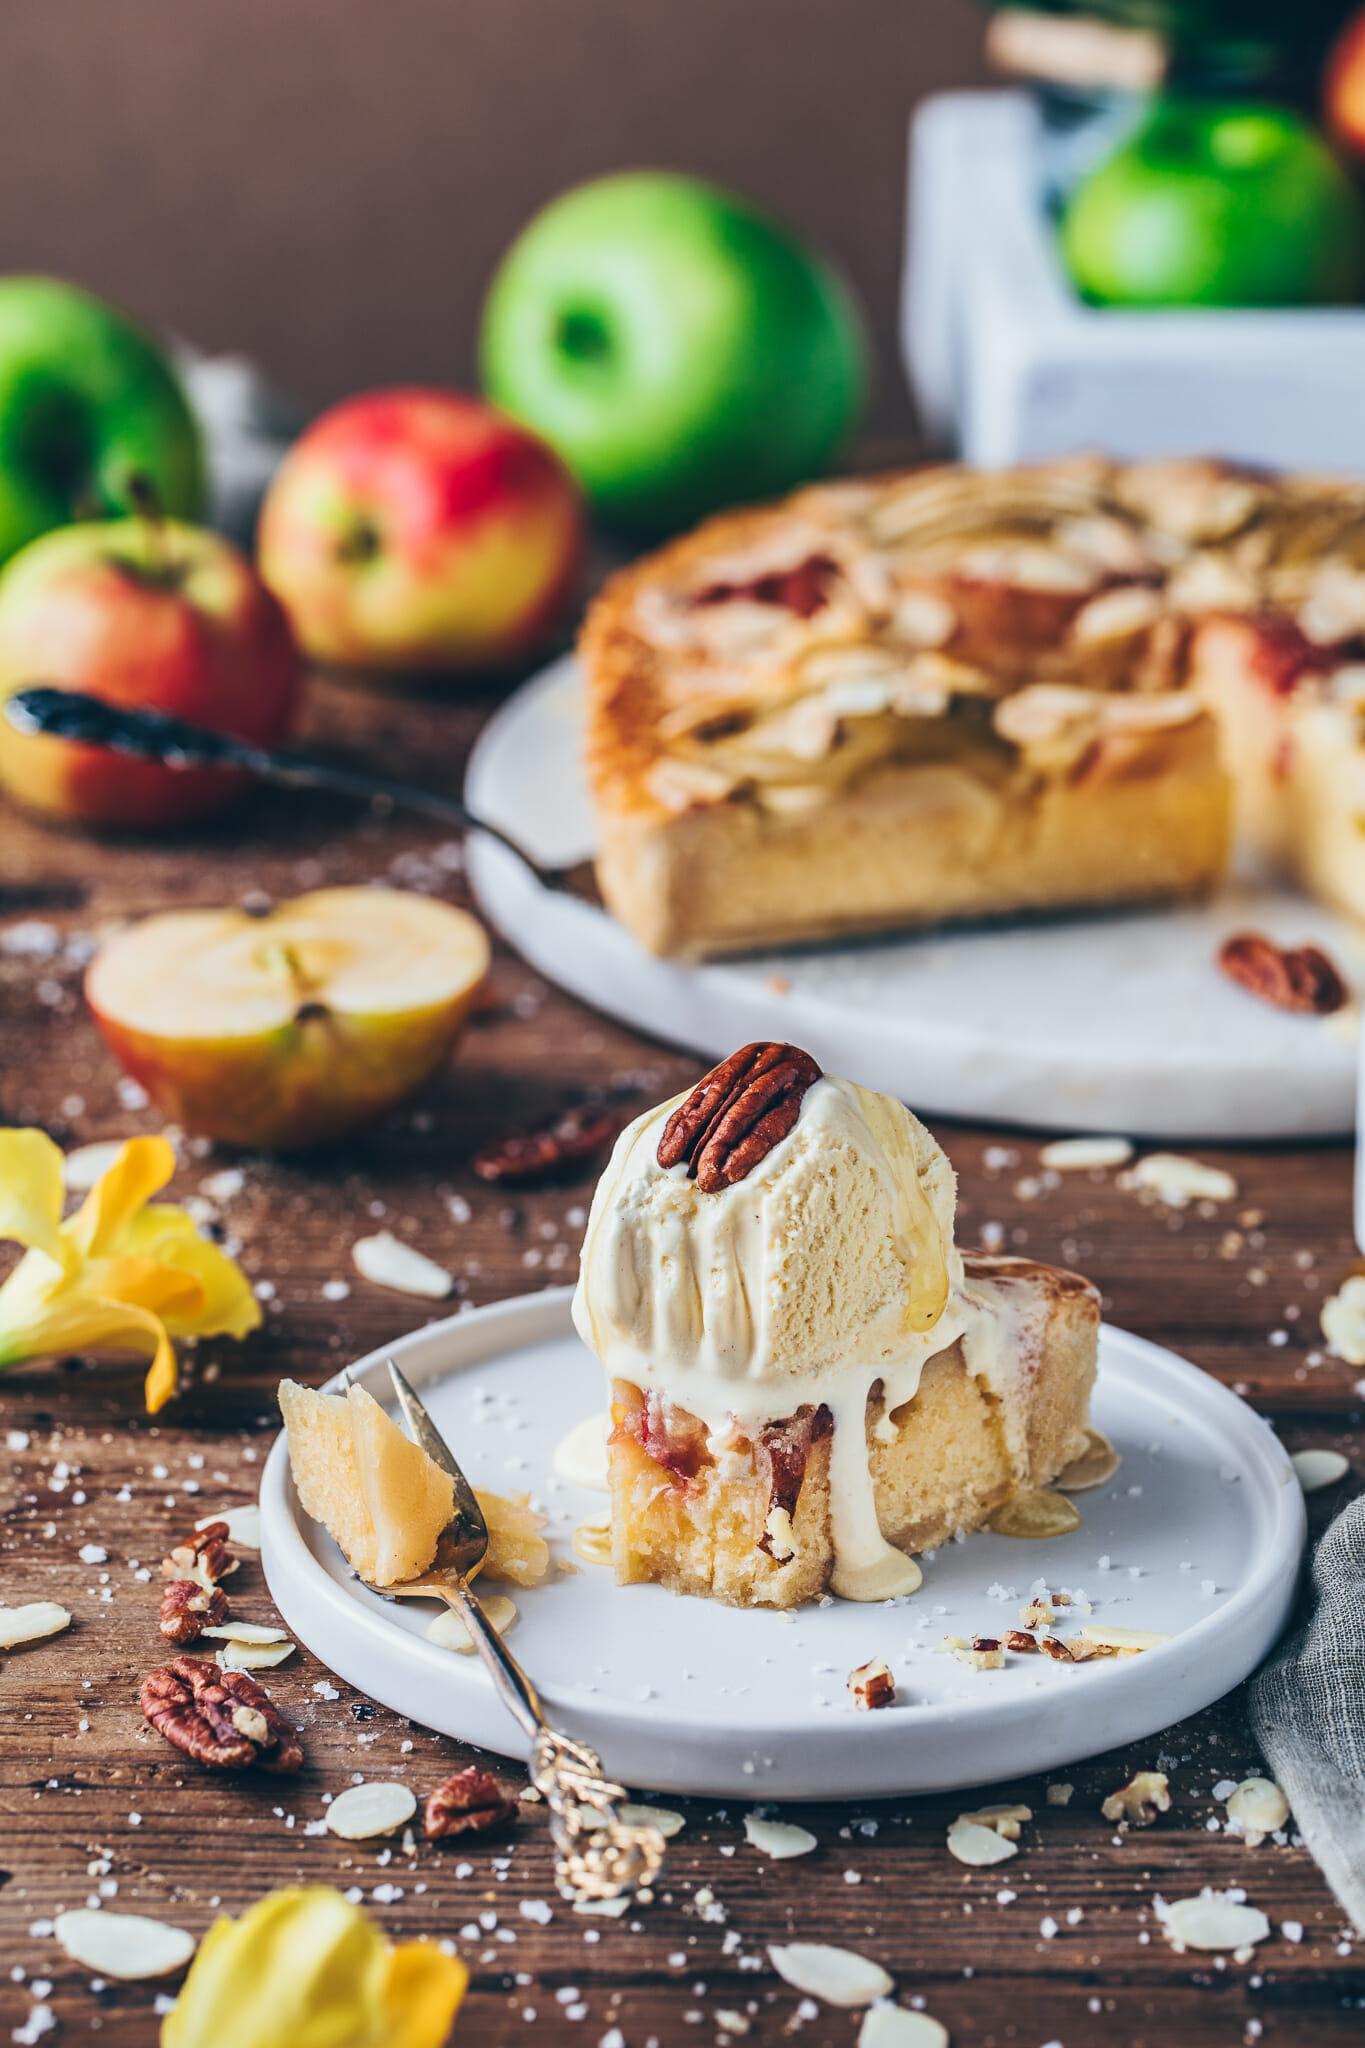 Best Vegan Apple Tart Recipe with almonds